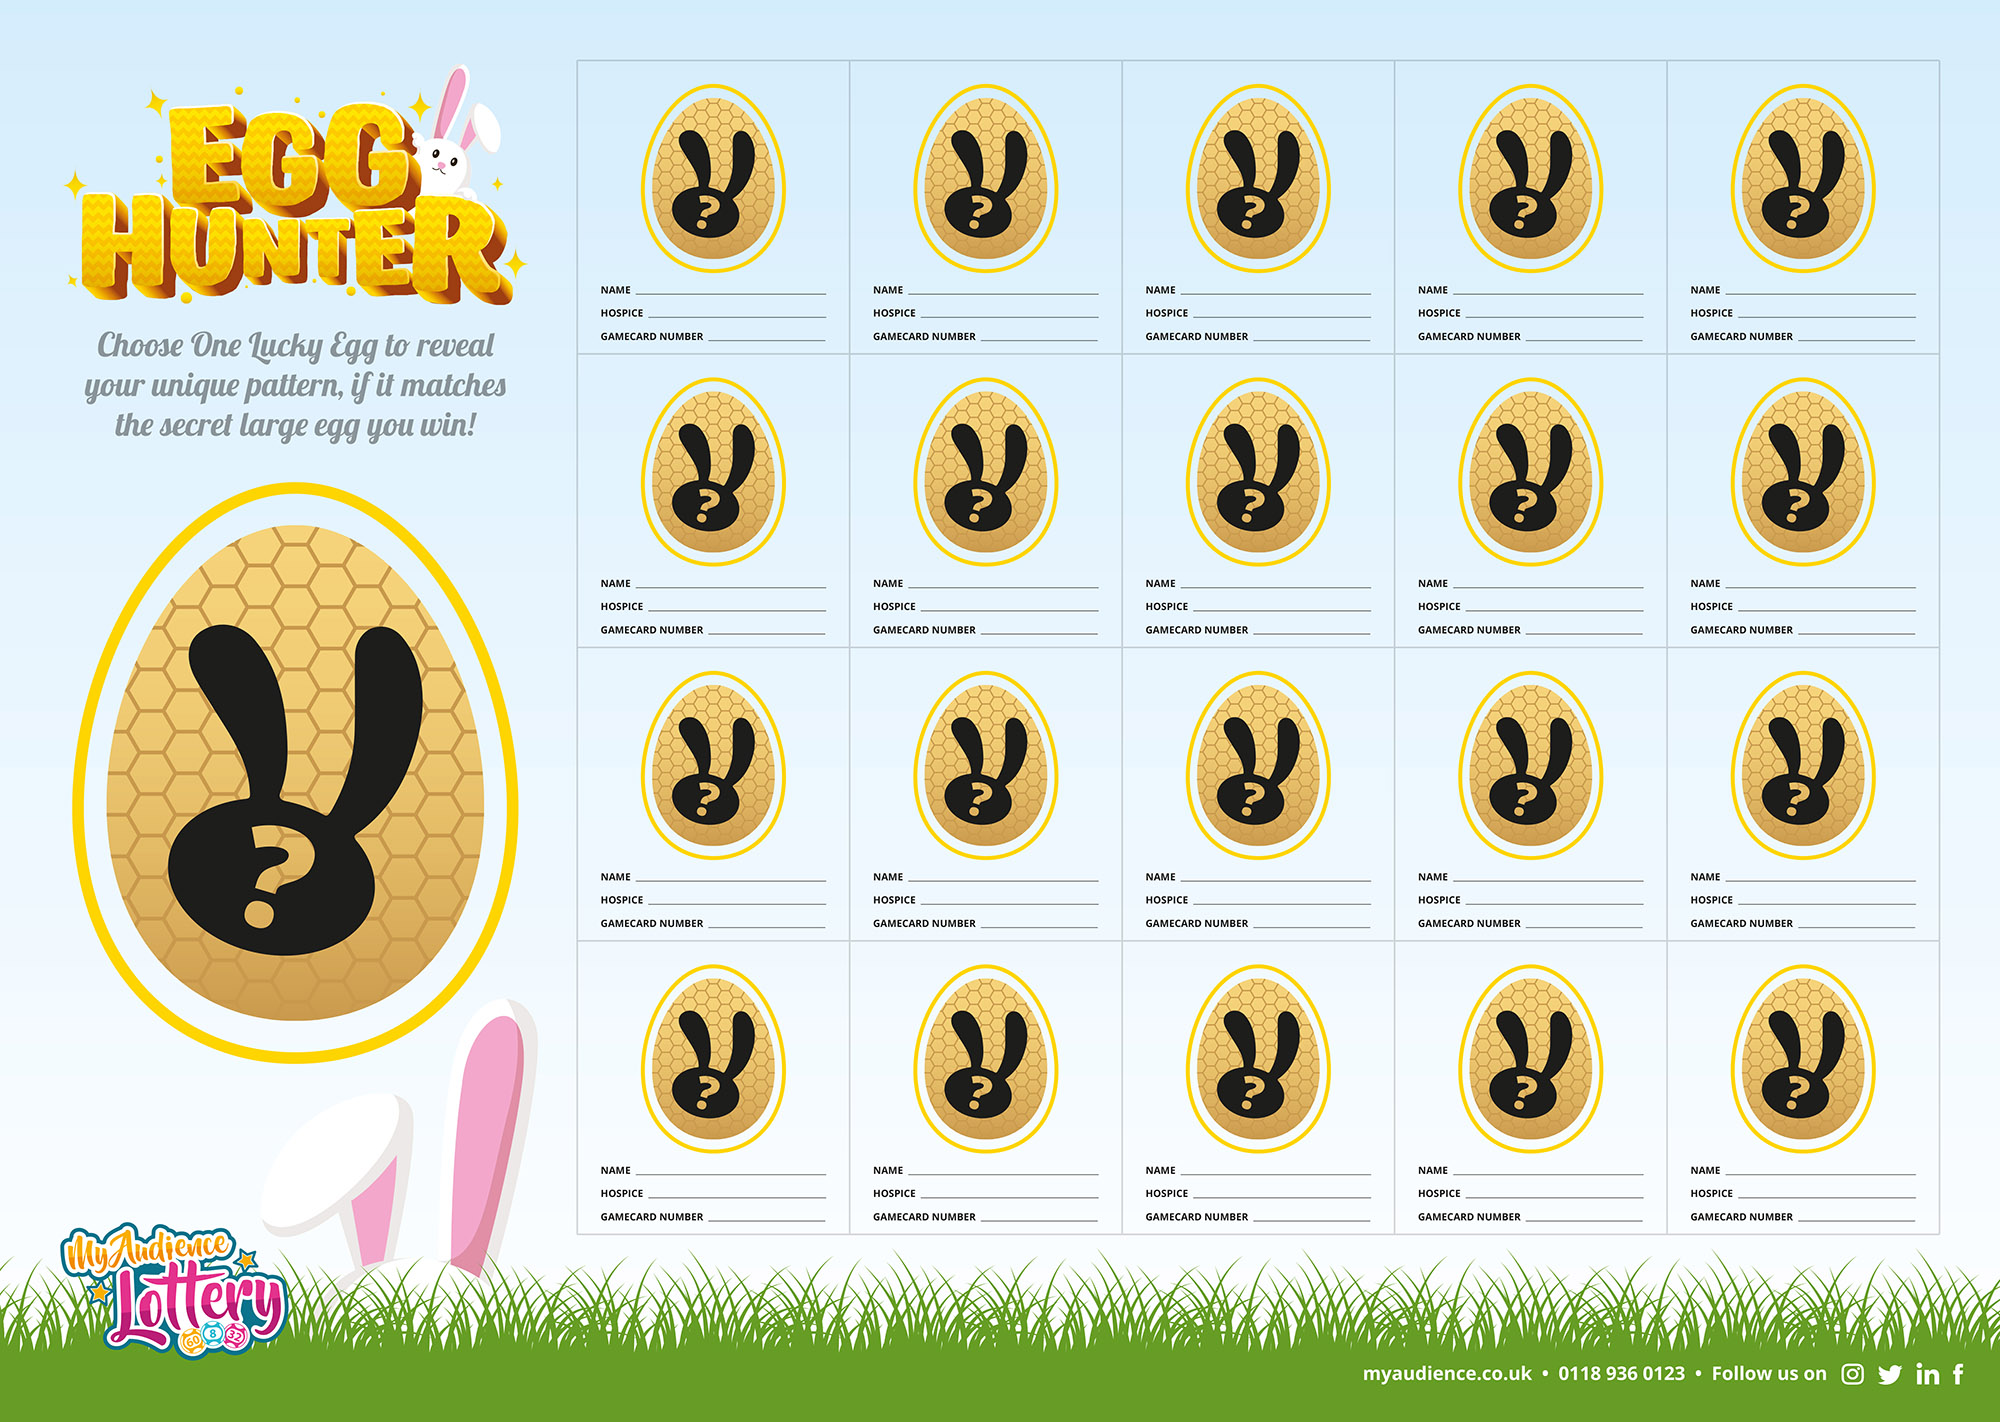 MyAudience Egg hunter scratchcard